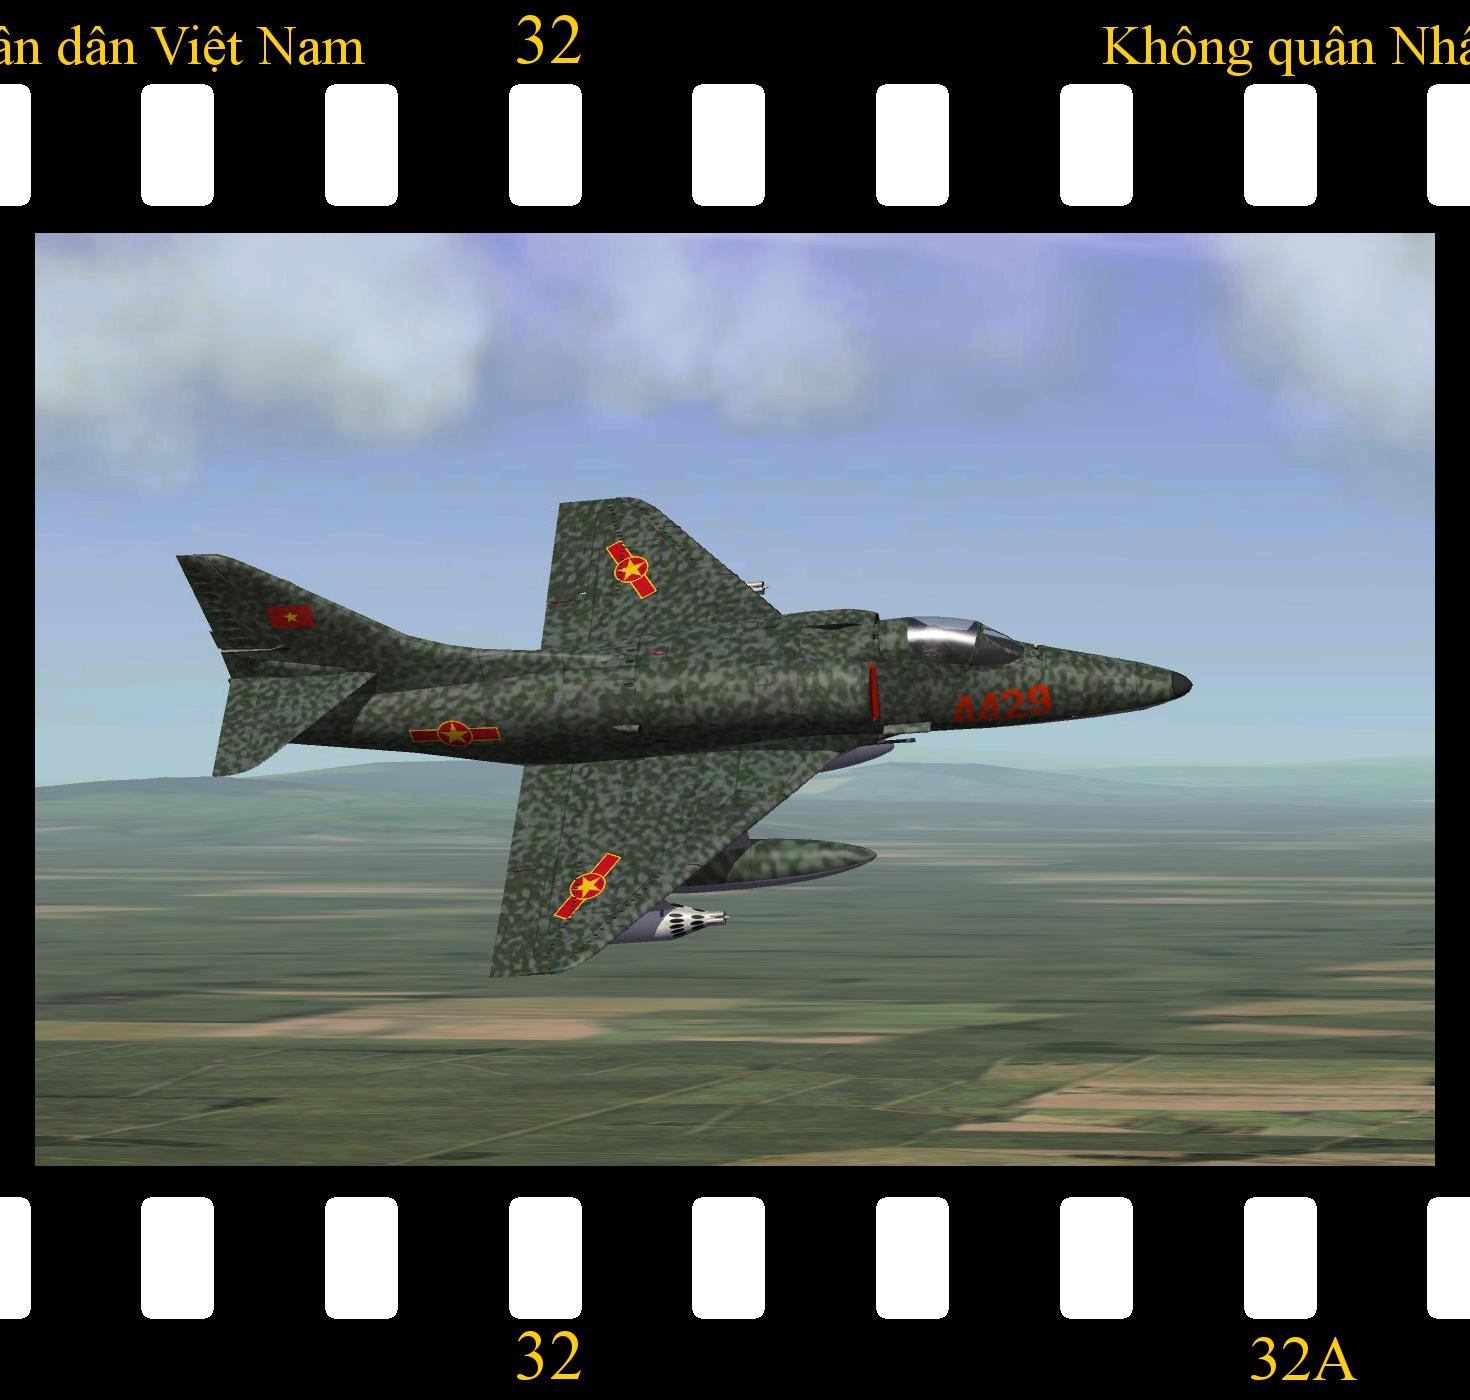 [Fictional] Douglas A-4E Skyhawk 'VPAF'